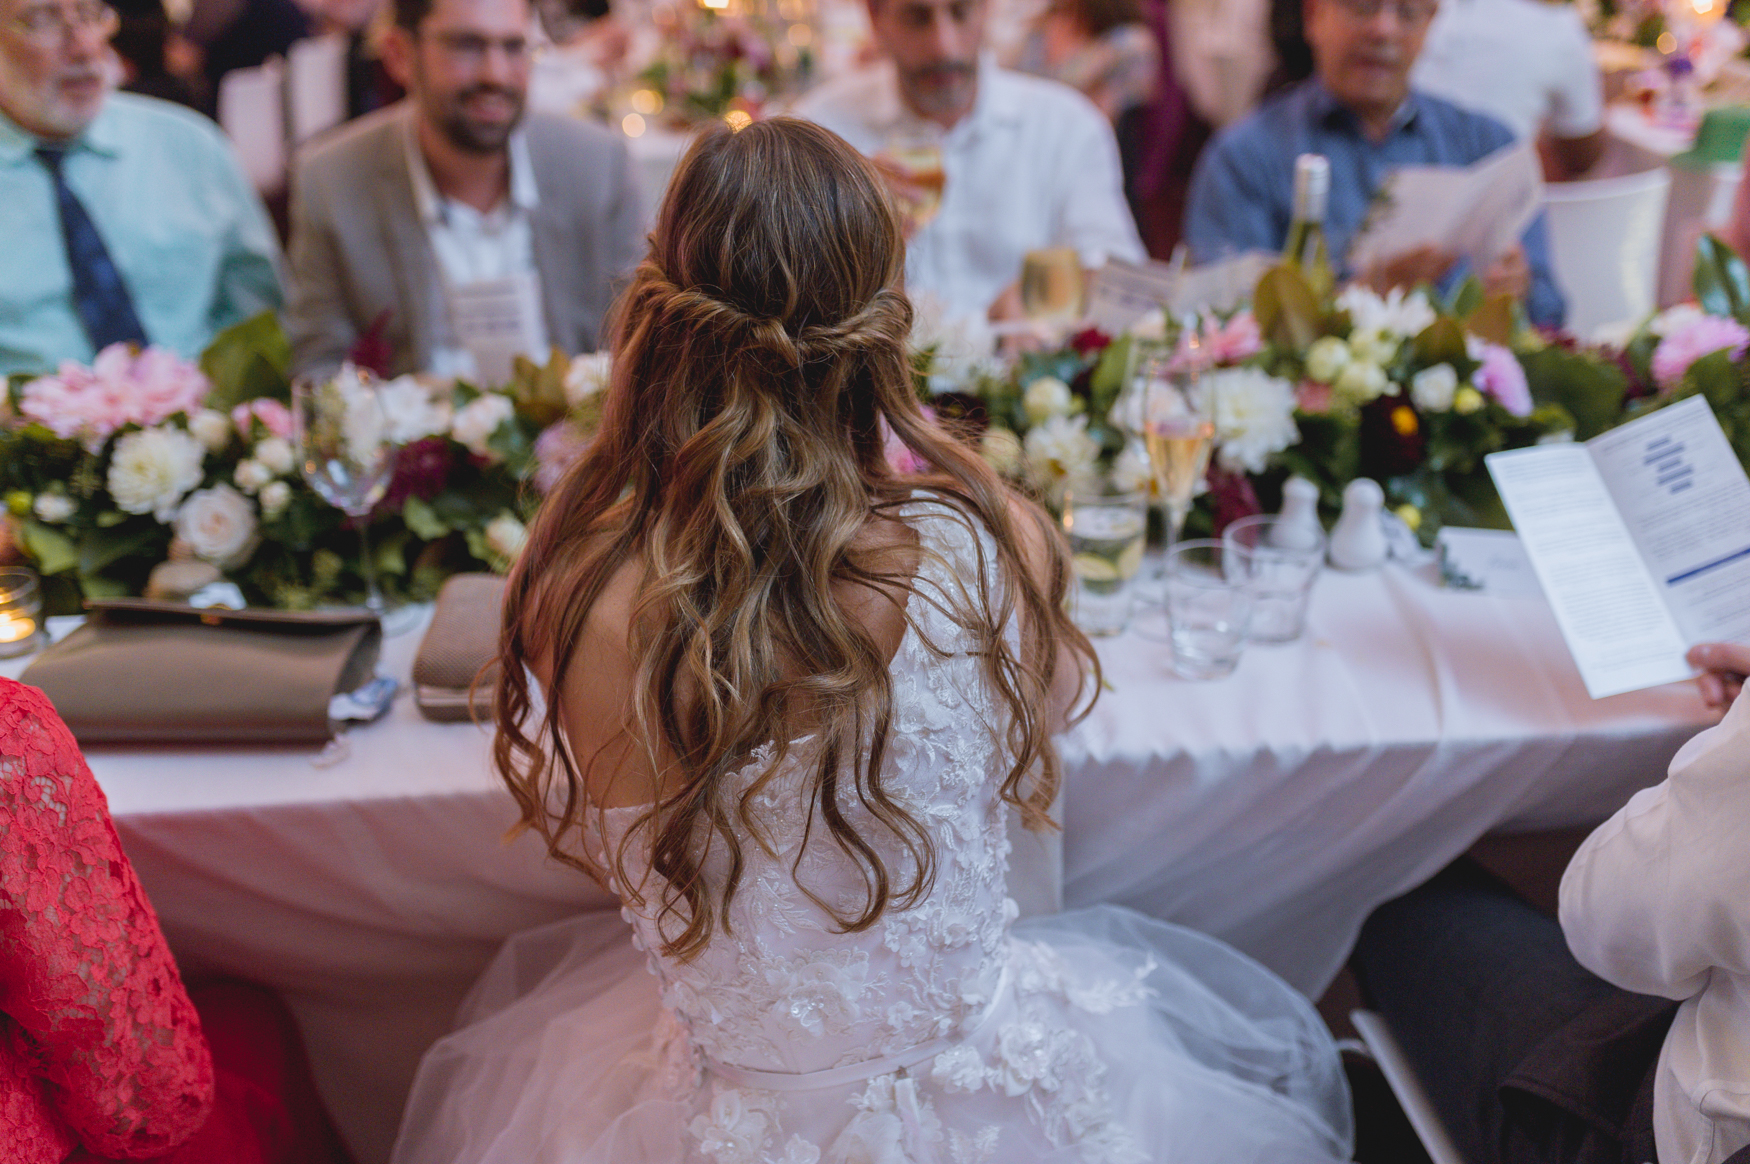 Leon_&_Martine's_Wedding_Photographs_17th_April_2019_@johnhenryweddingphoto_Low_Resolution_Web-590.JPG